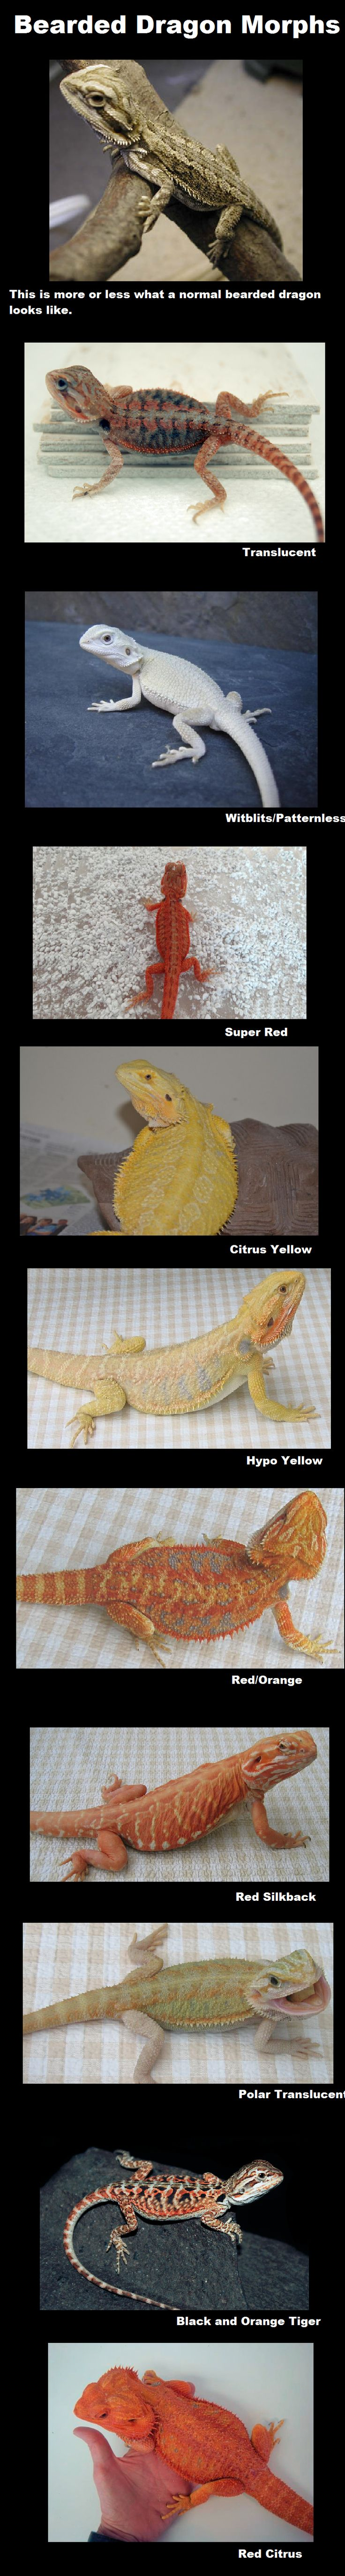 Bearded Dragon Morphs #funny #lol #humor